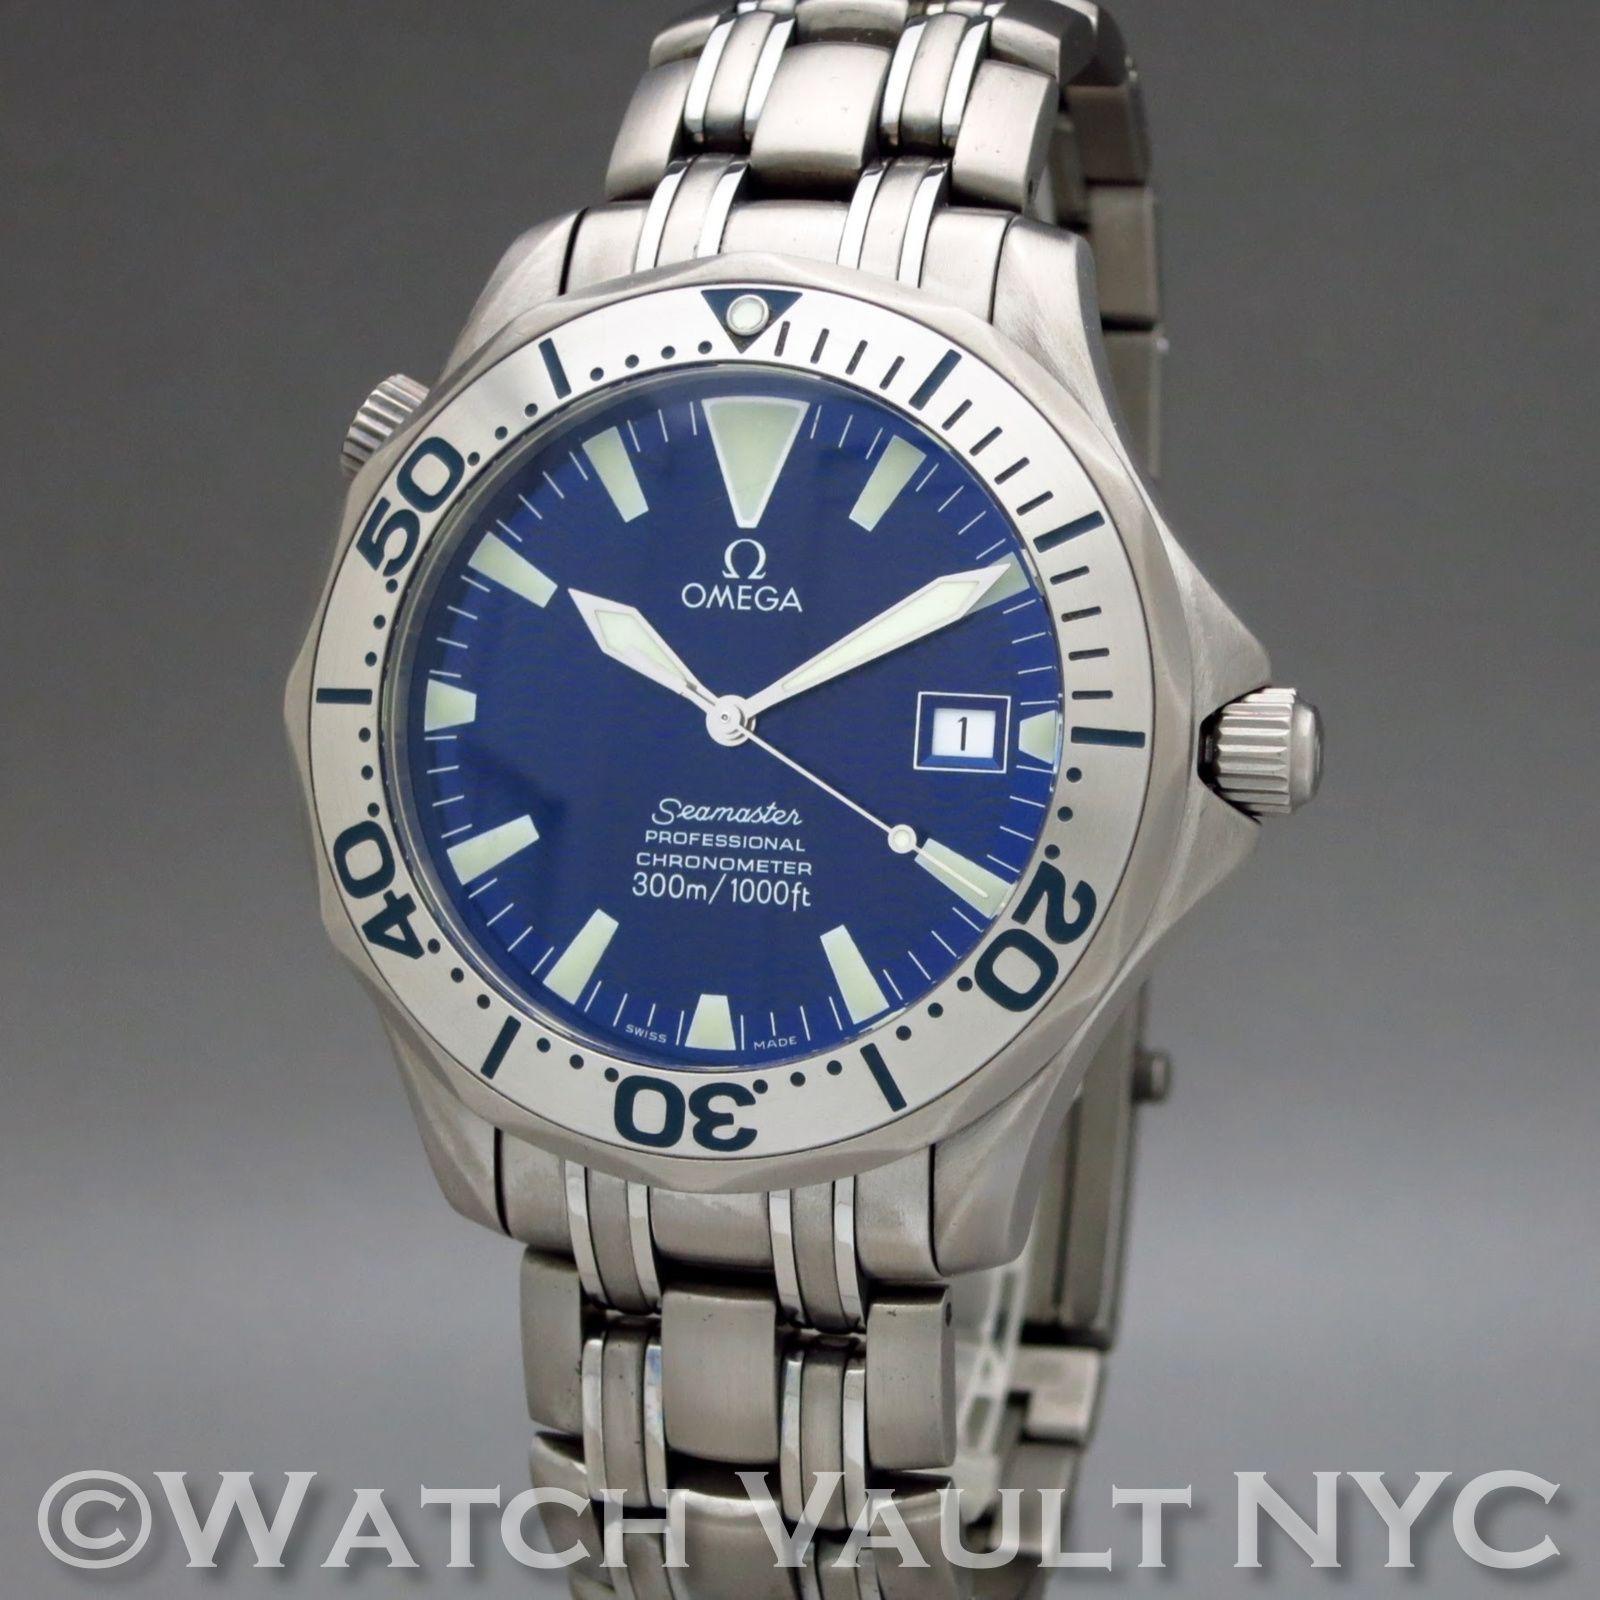 Omega Seamaster Professional 300m Chronometer Electric Blue Omega Seamaster Omega Omega Seamaster Professional